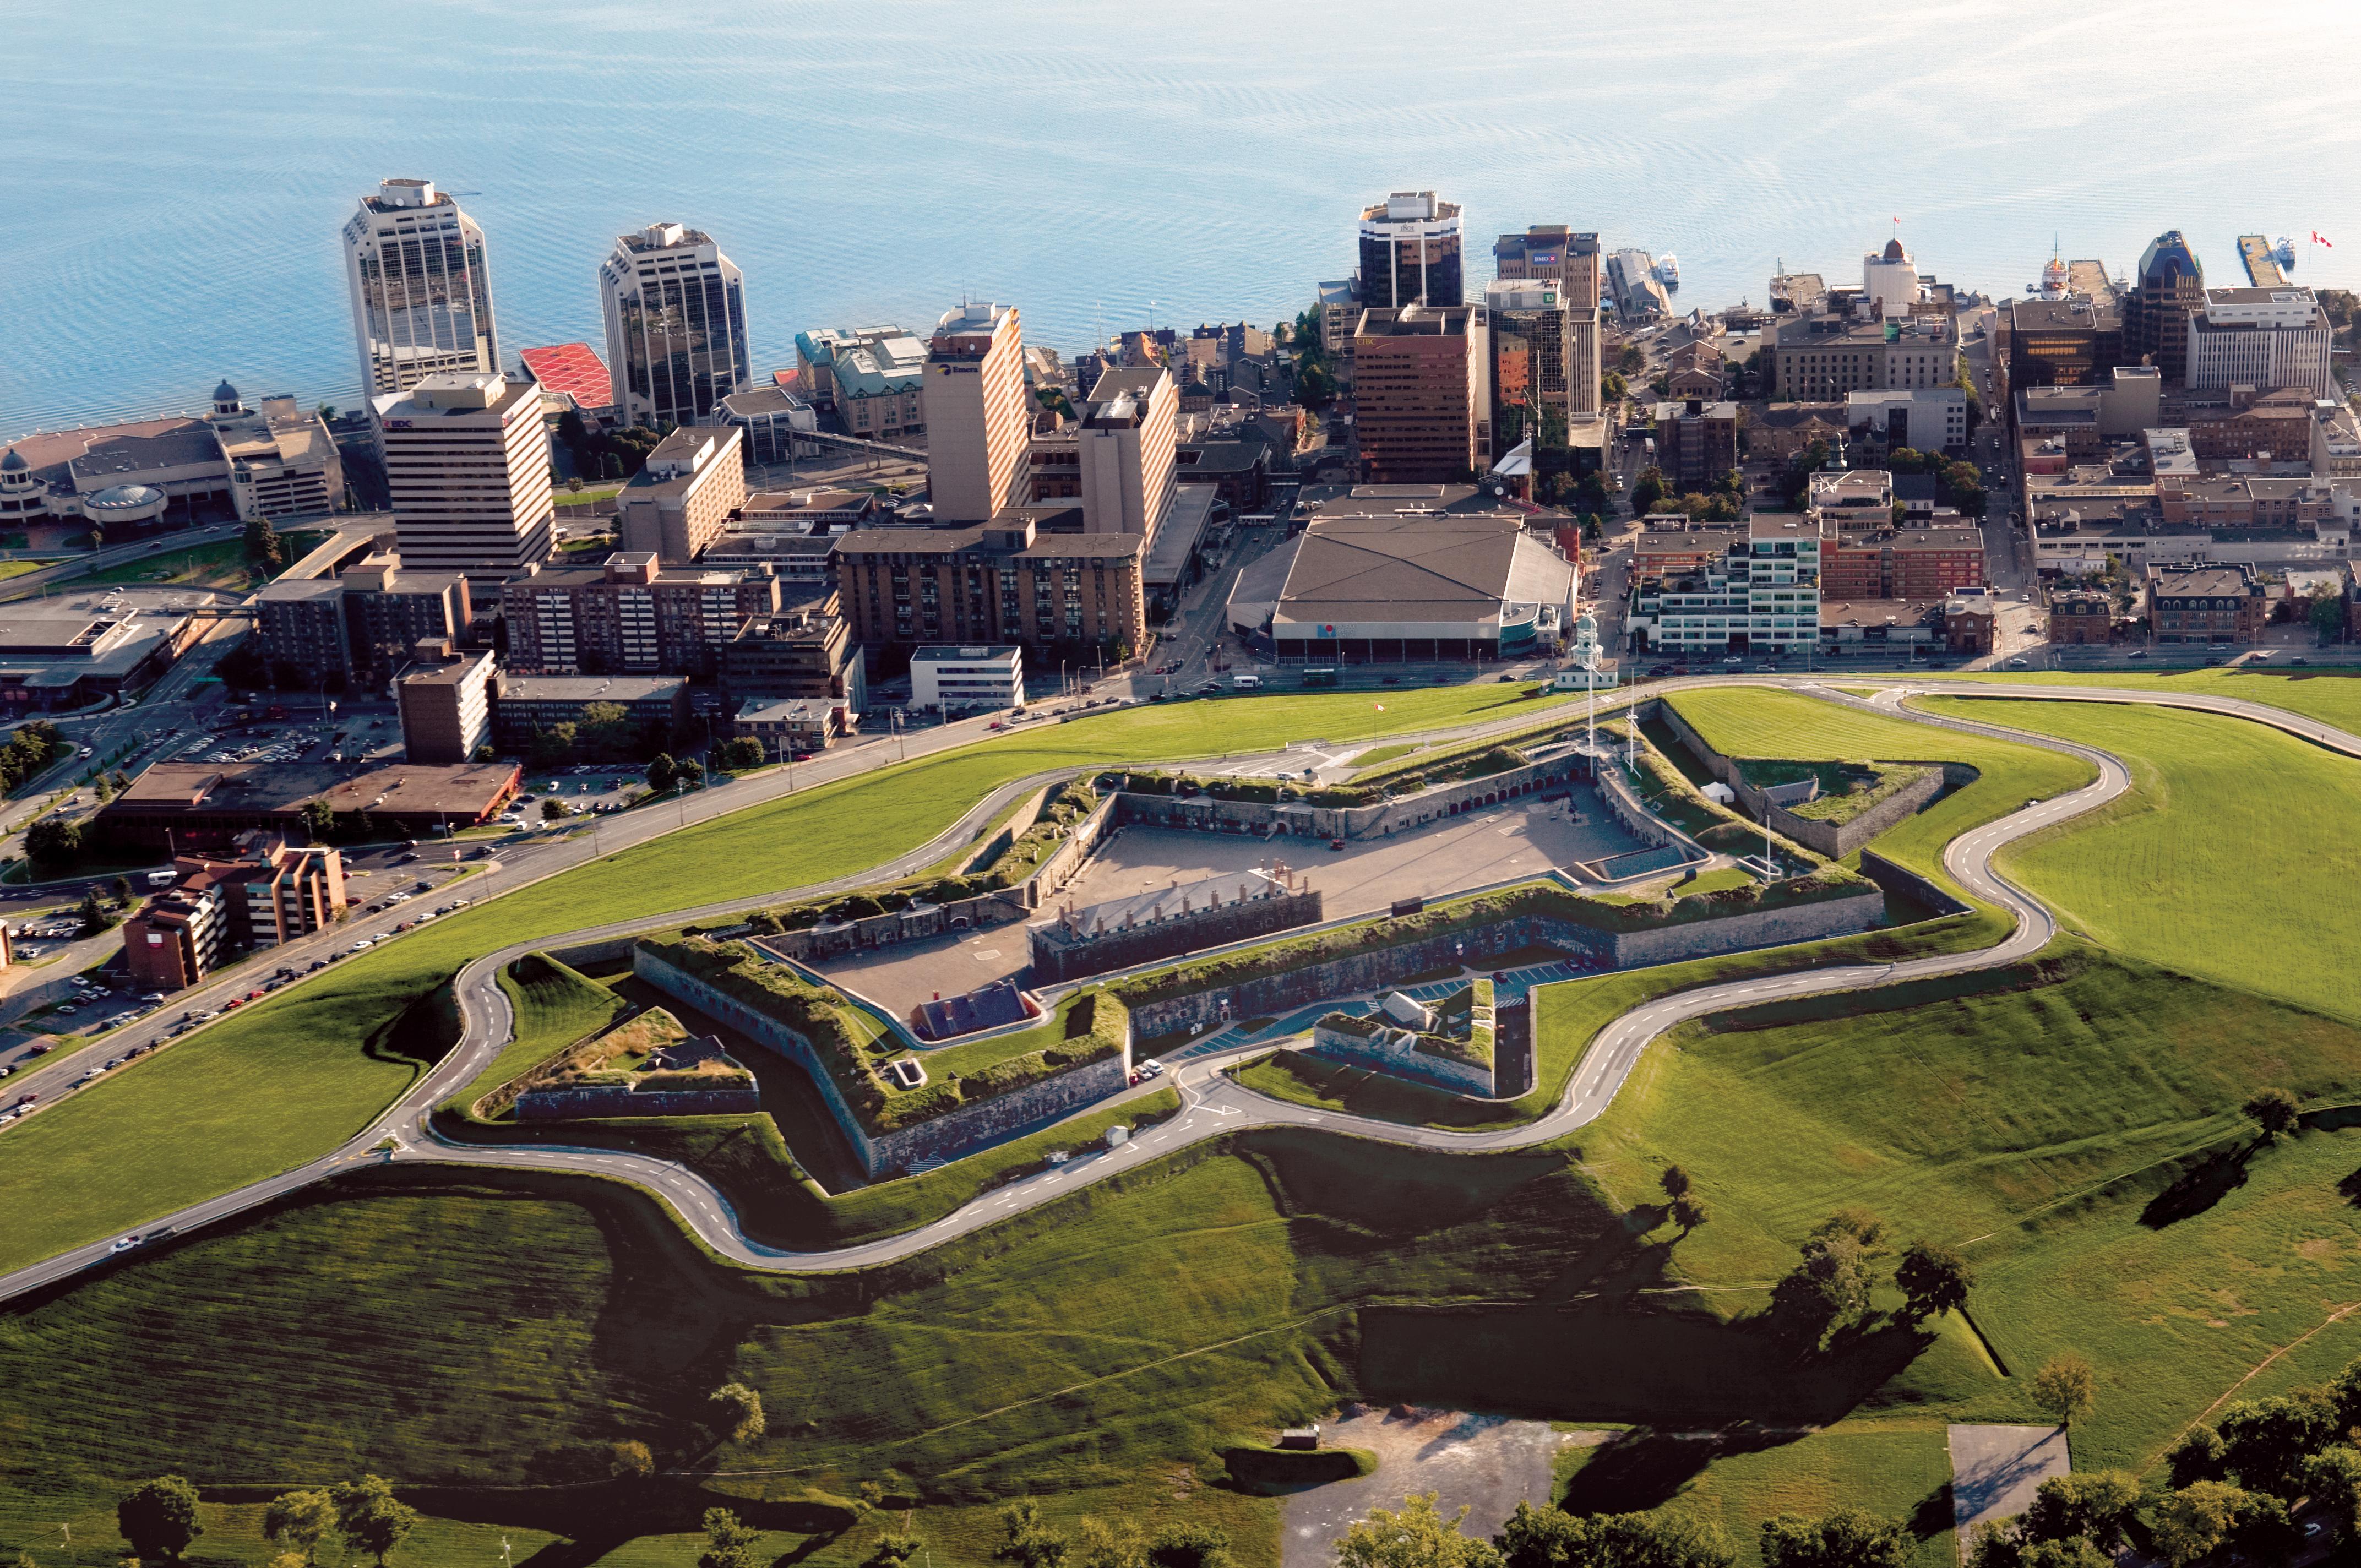 La citadelle d'Halifax